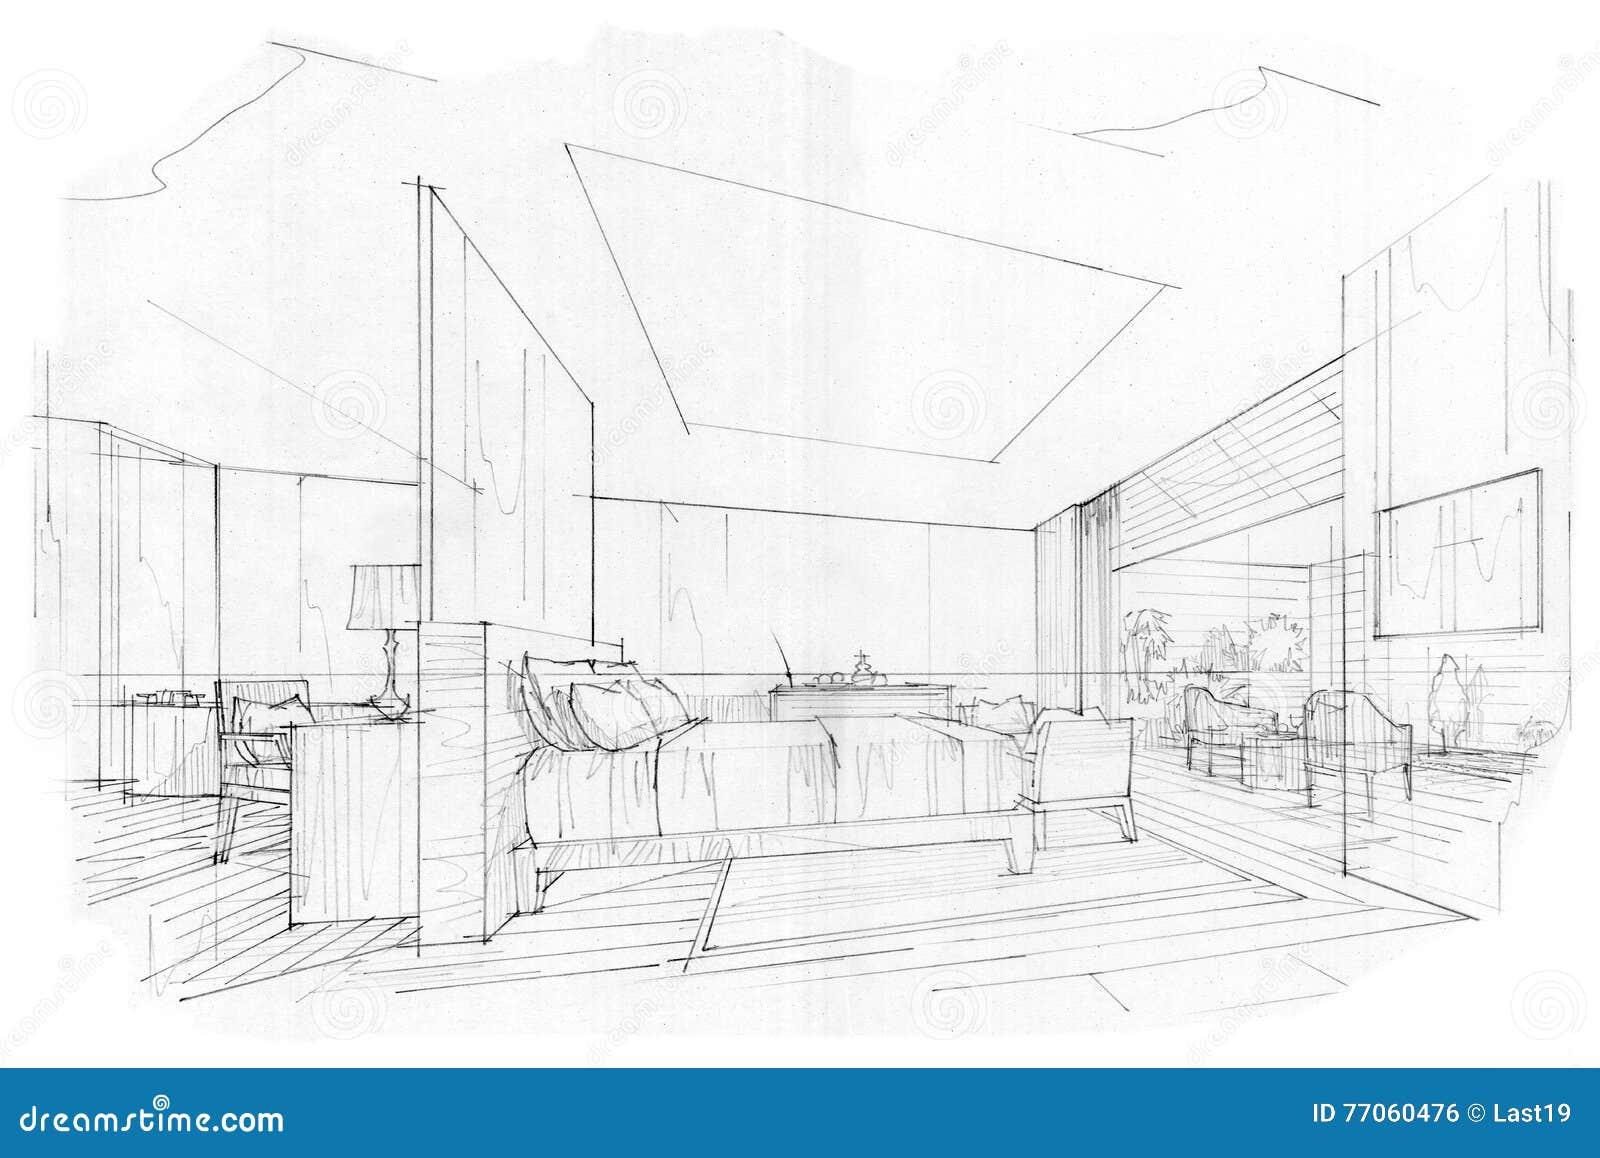 Interior design drawings perspective Reception Sketch Perspective Interior Bedroom Black And White Interior Design Dreamstimecom Sketch Perspective Interior Bedroom Black And White Interior